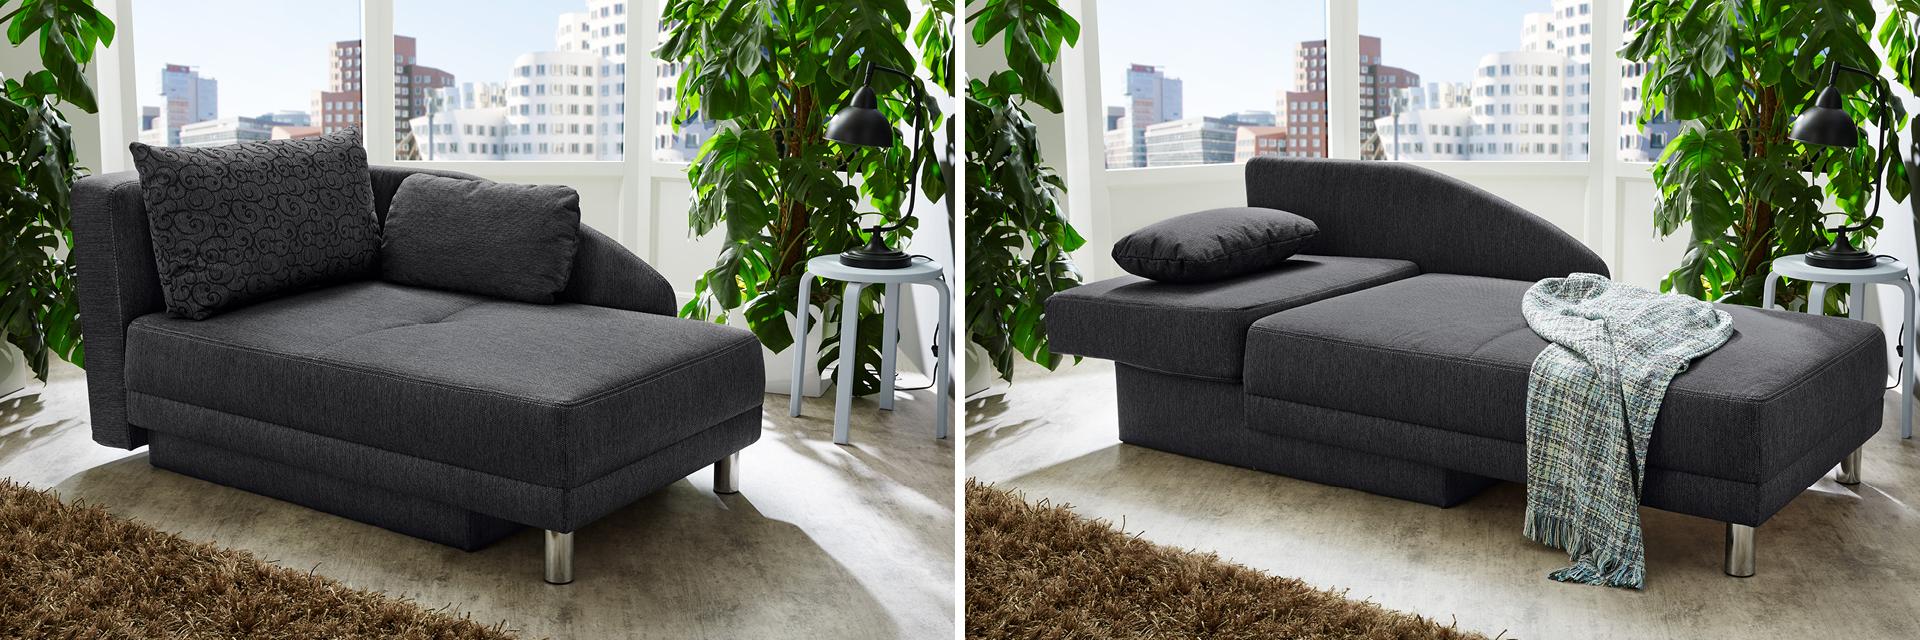 Kleine Räume, passende Möbel